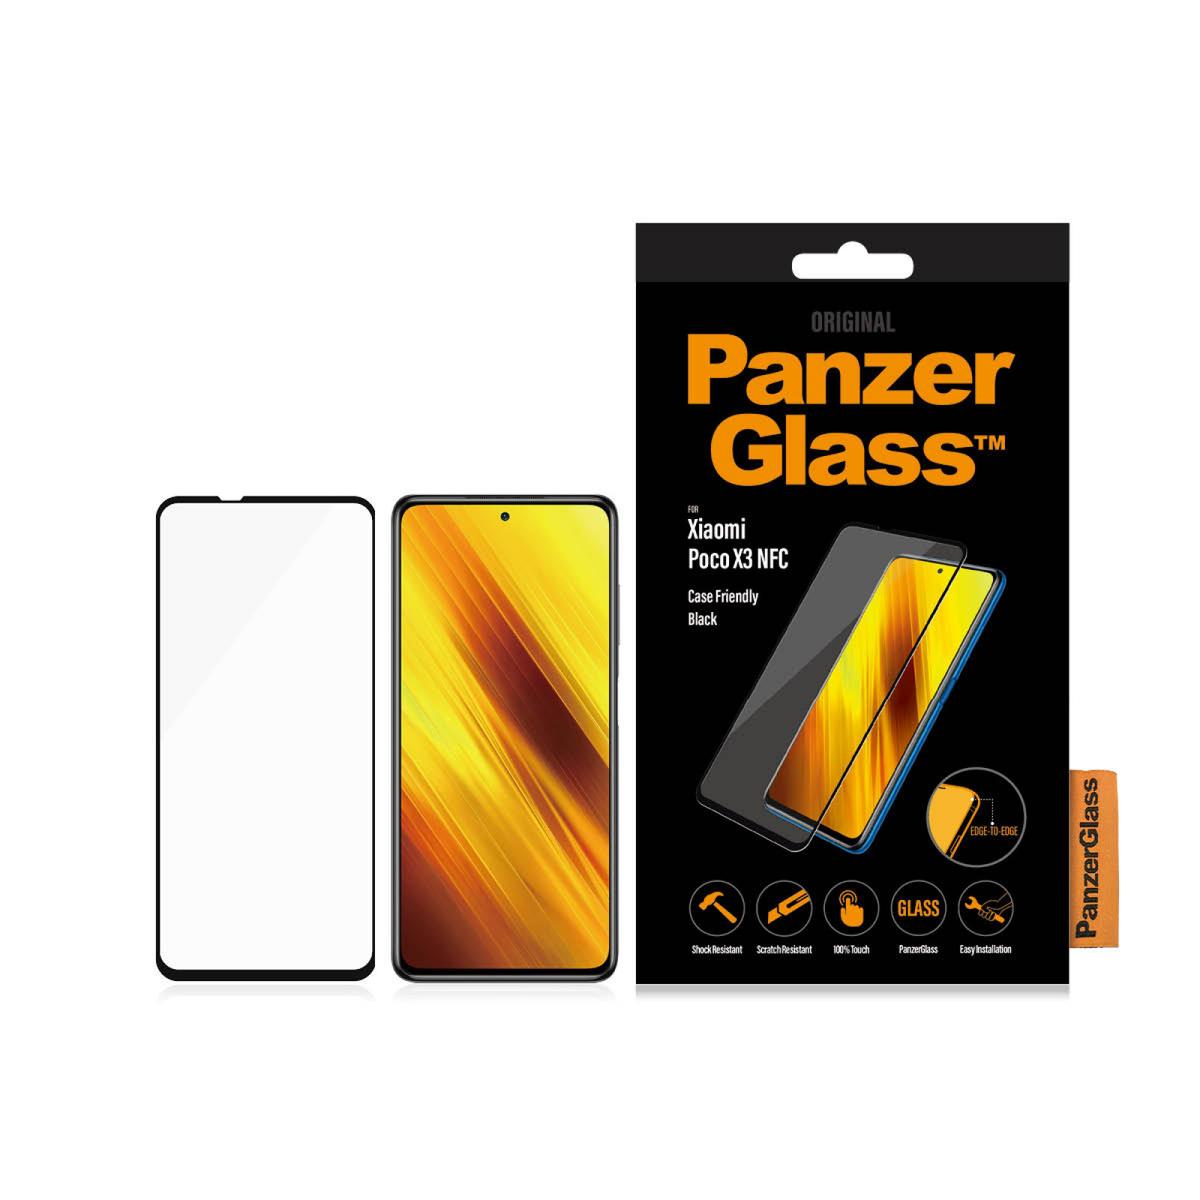 Стъклен протектор PanzerGlass за  Xiaomi Poco X3 , caseFriendly - Черен